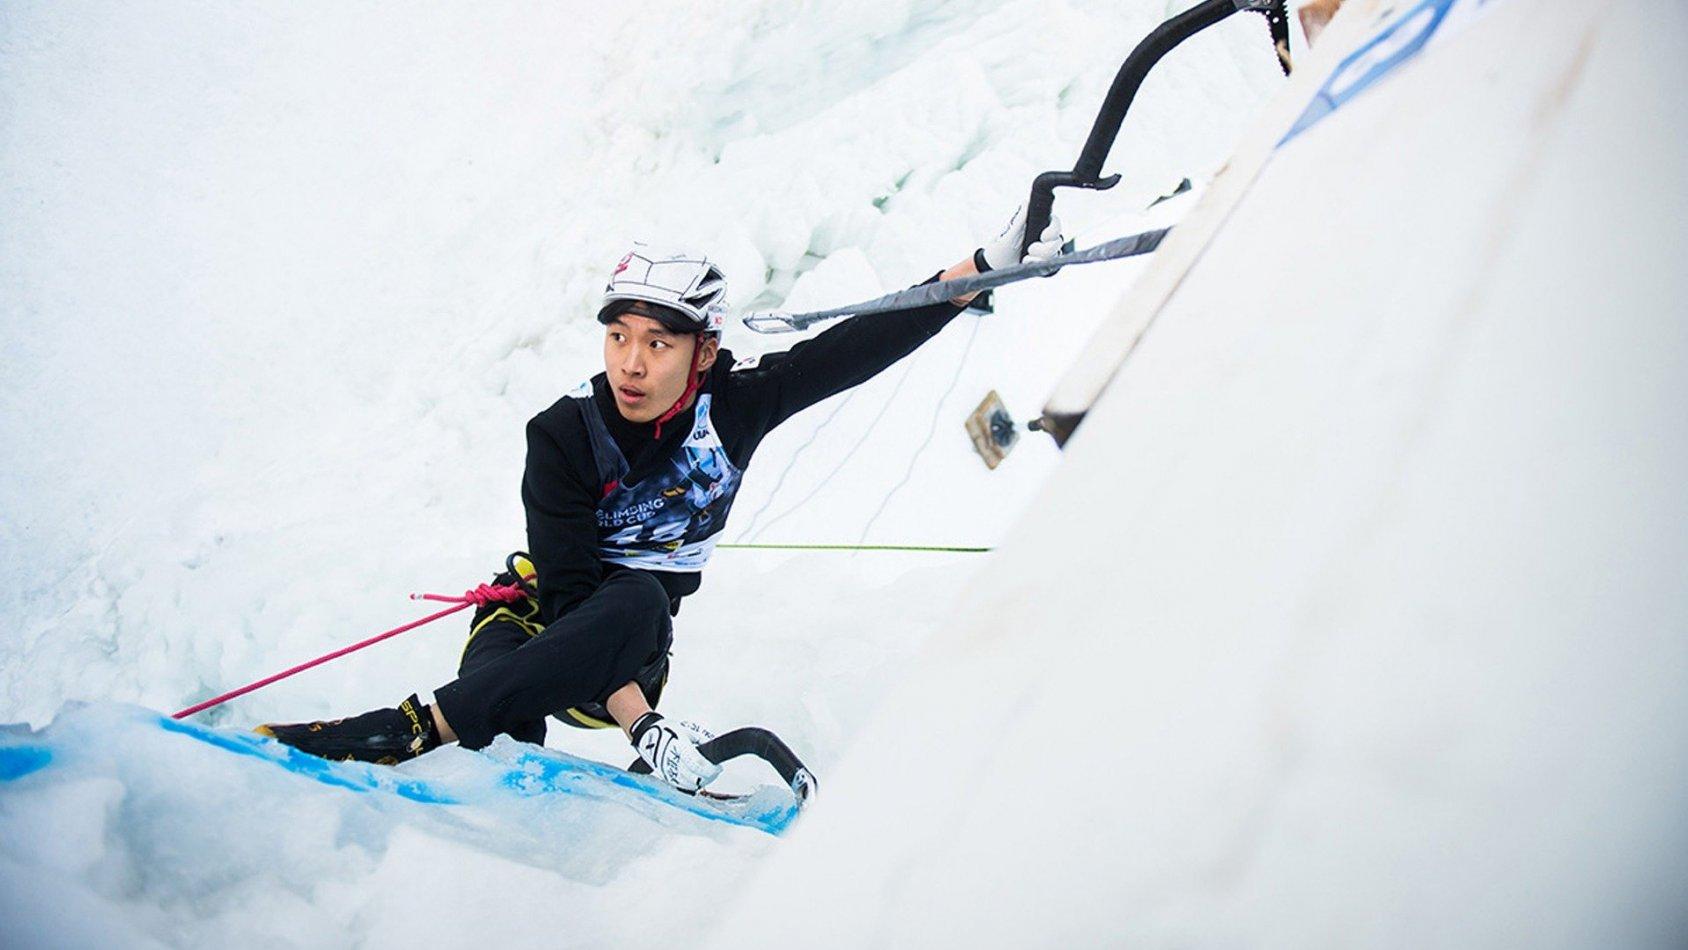 UIAA Ice Climbing World Tour